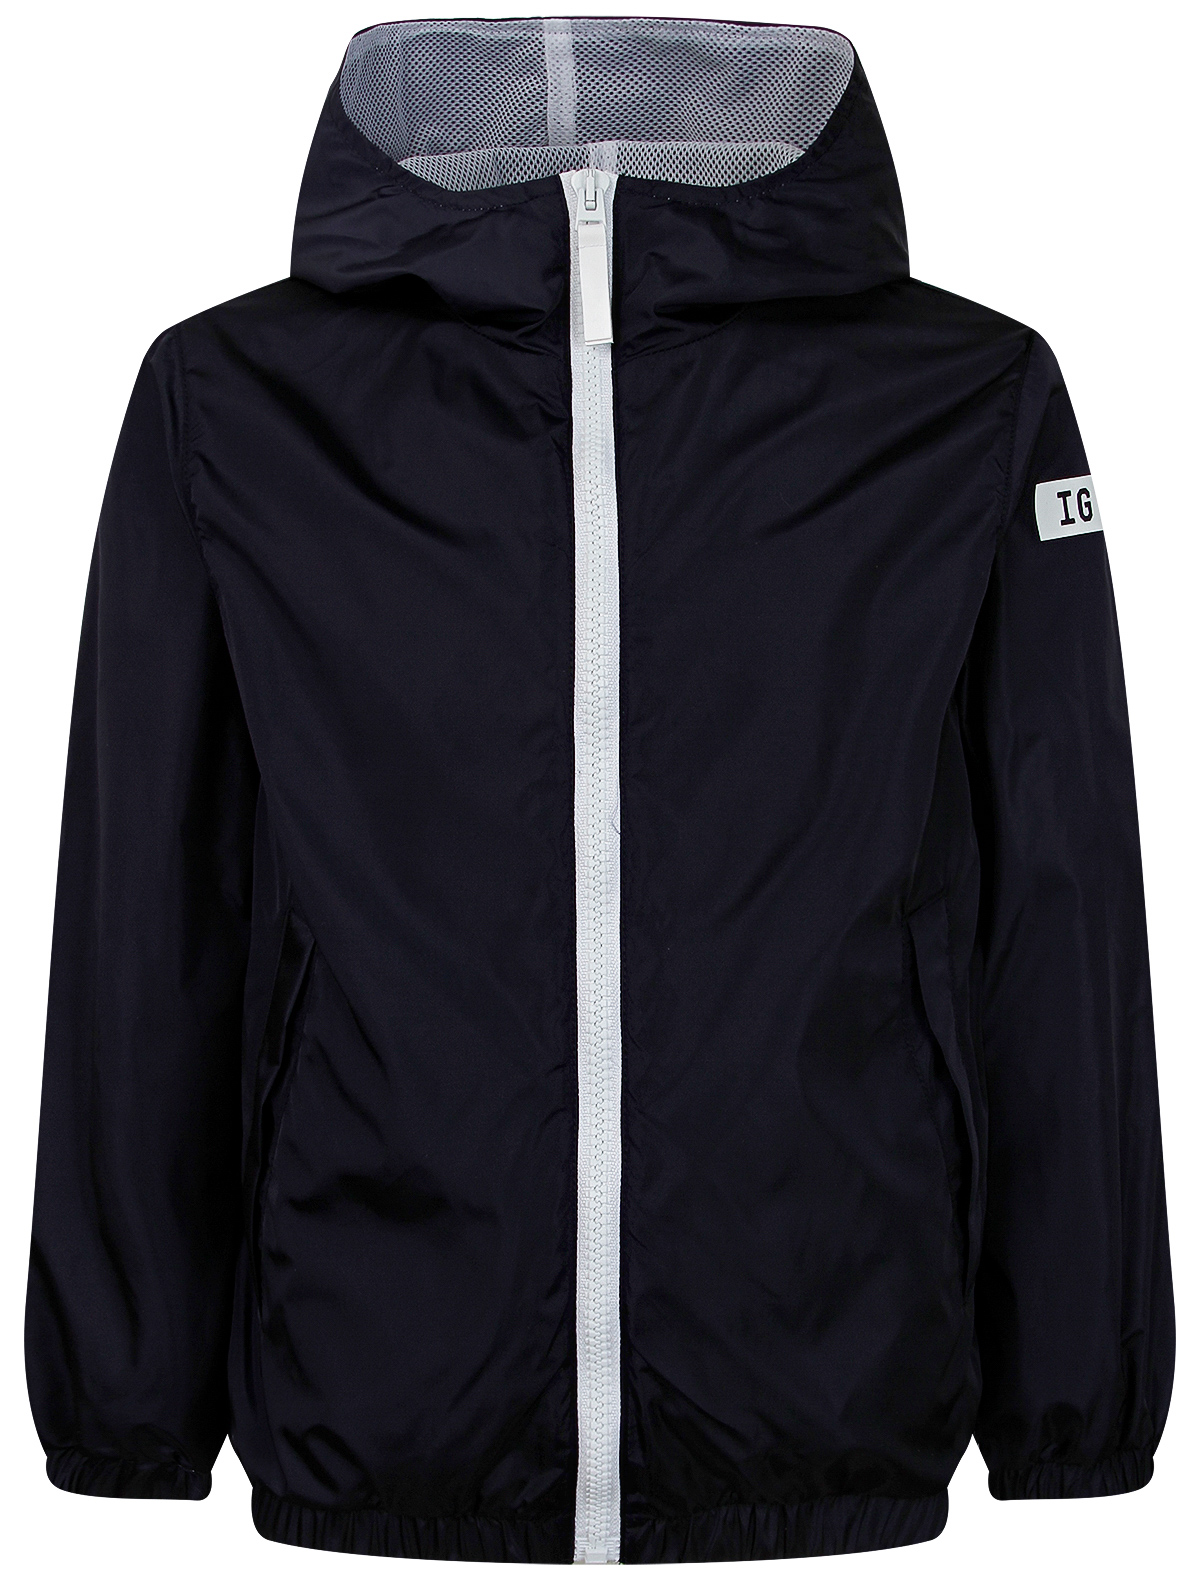 2281256, Куртка Il Gufo, синий, Мужской, 1074519170249  - купить со скидкой